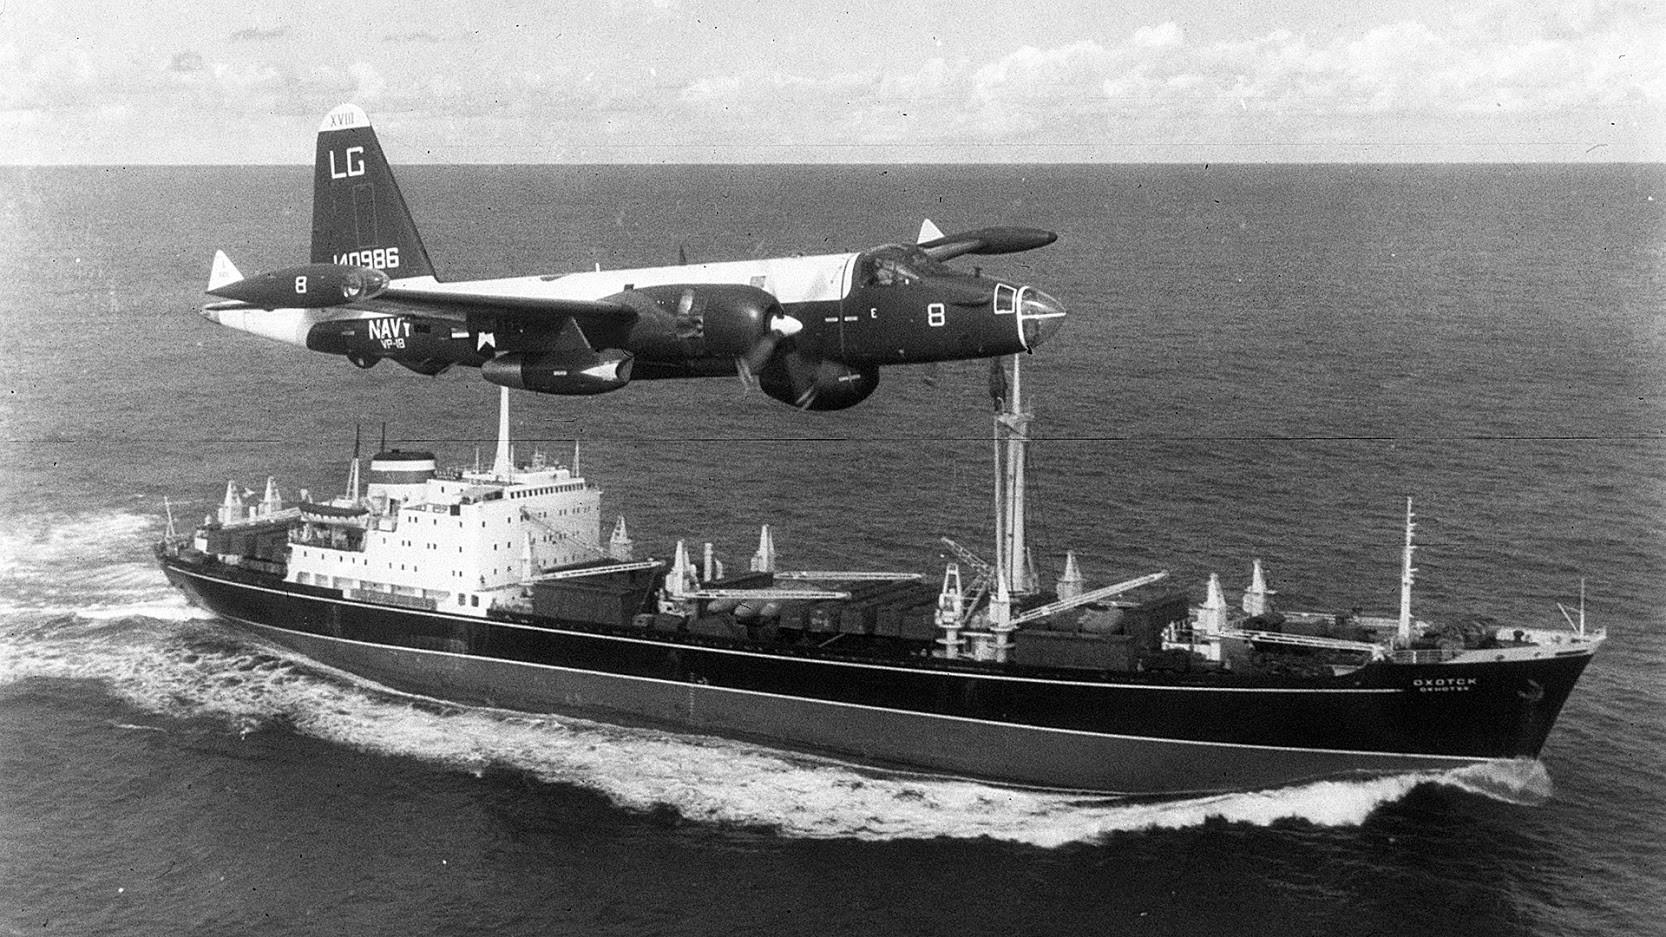 P2V Neptune, амерички патролни брод надлеће совјетски теретни бродо у време Карипске кризе